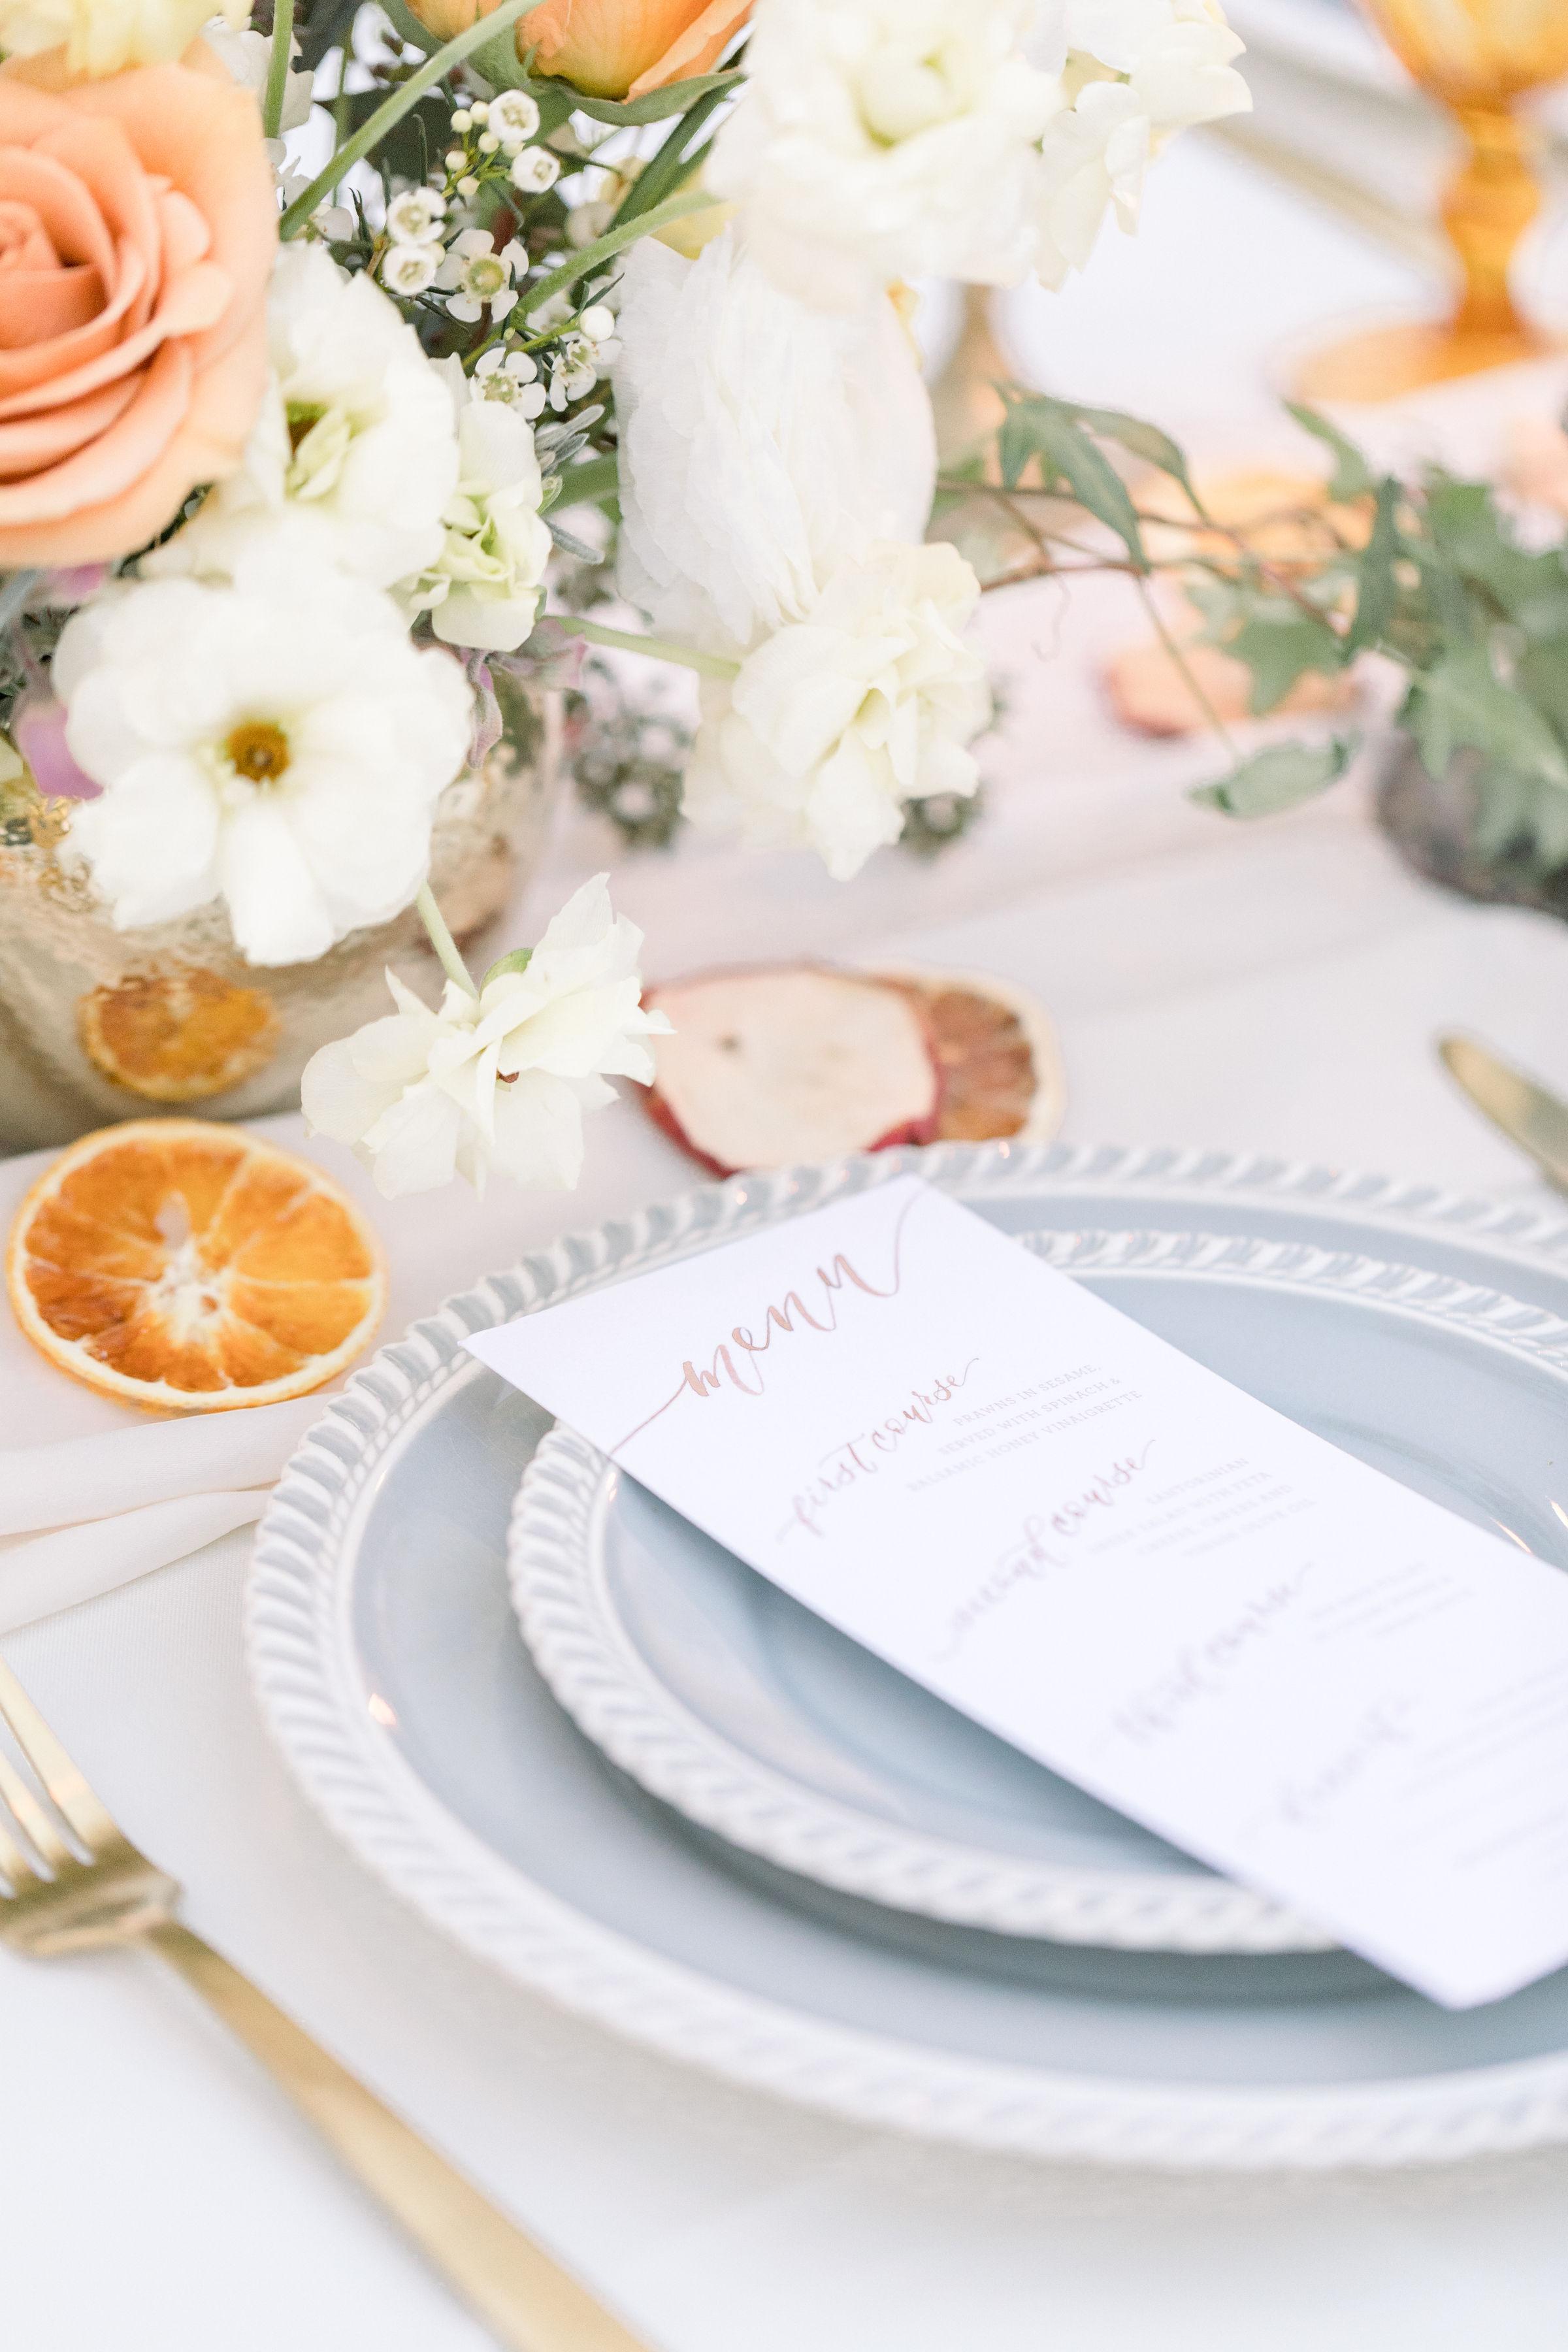 StephanieWeberPhotography-Brown Wedding Reception Tablescape – Sam Allen Creates Watercolor Menu